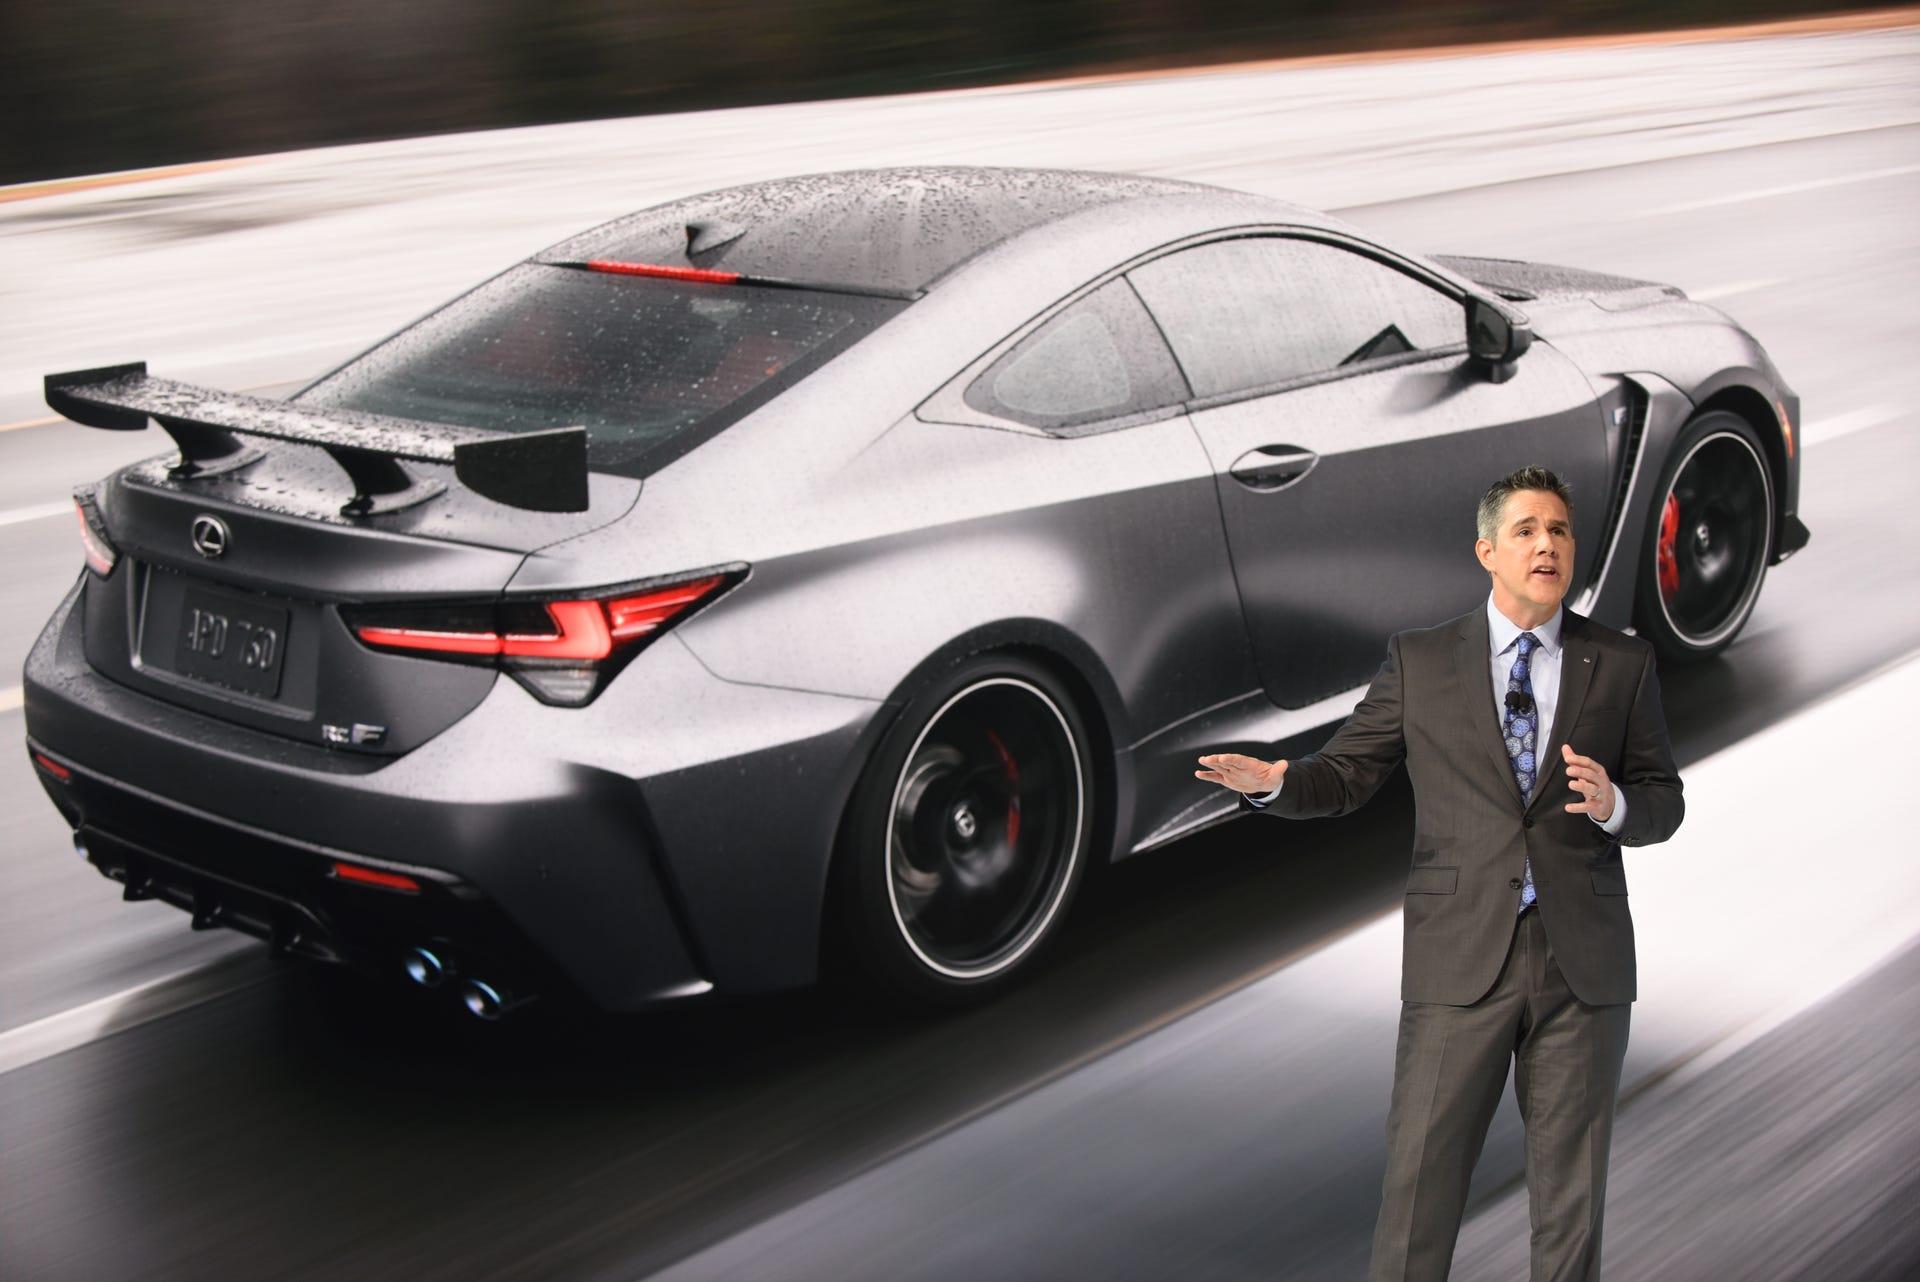 The 2020 Lexus Rc F Track Edition